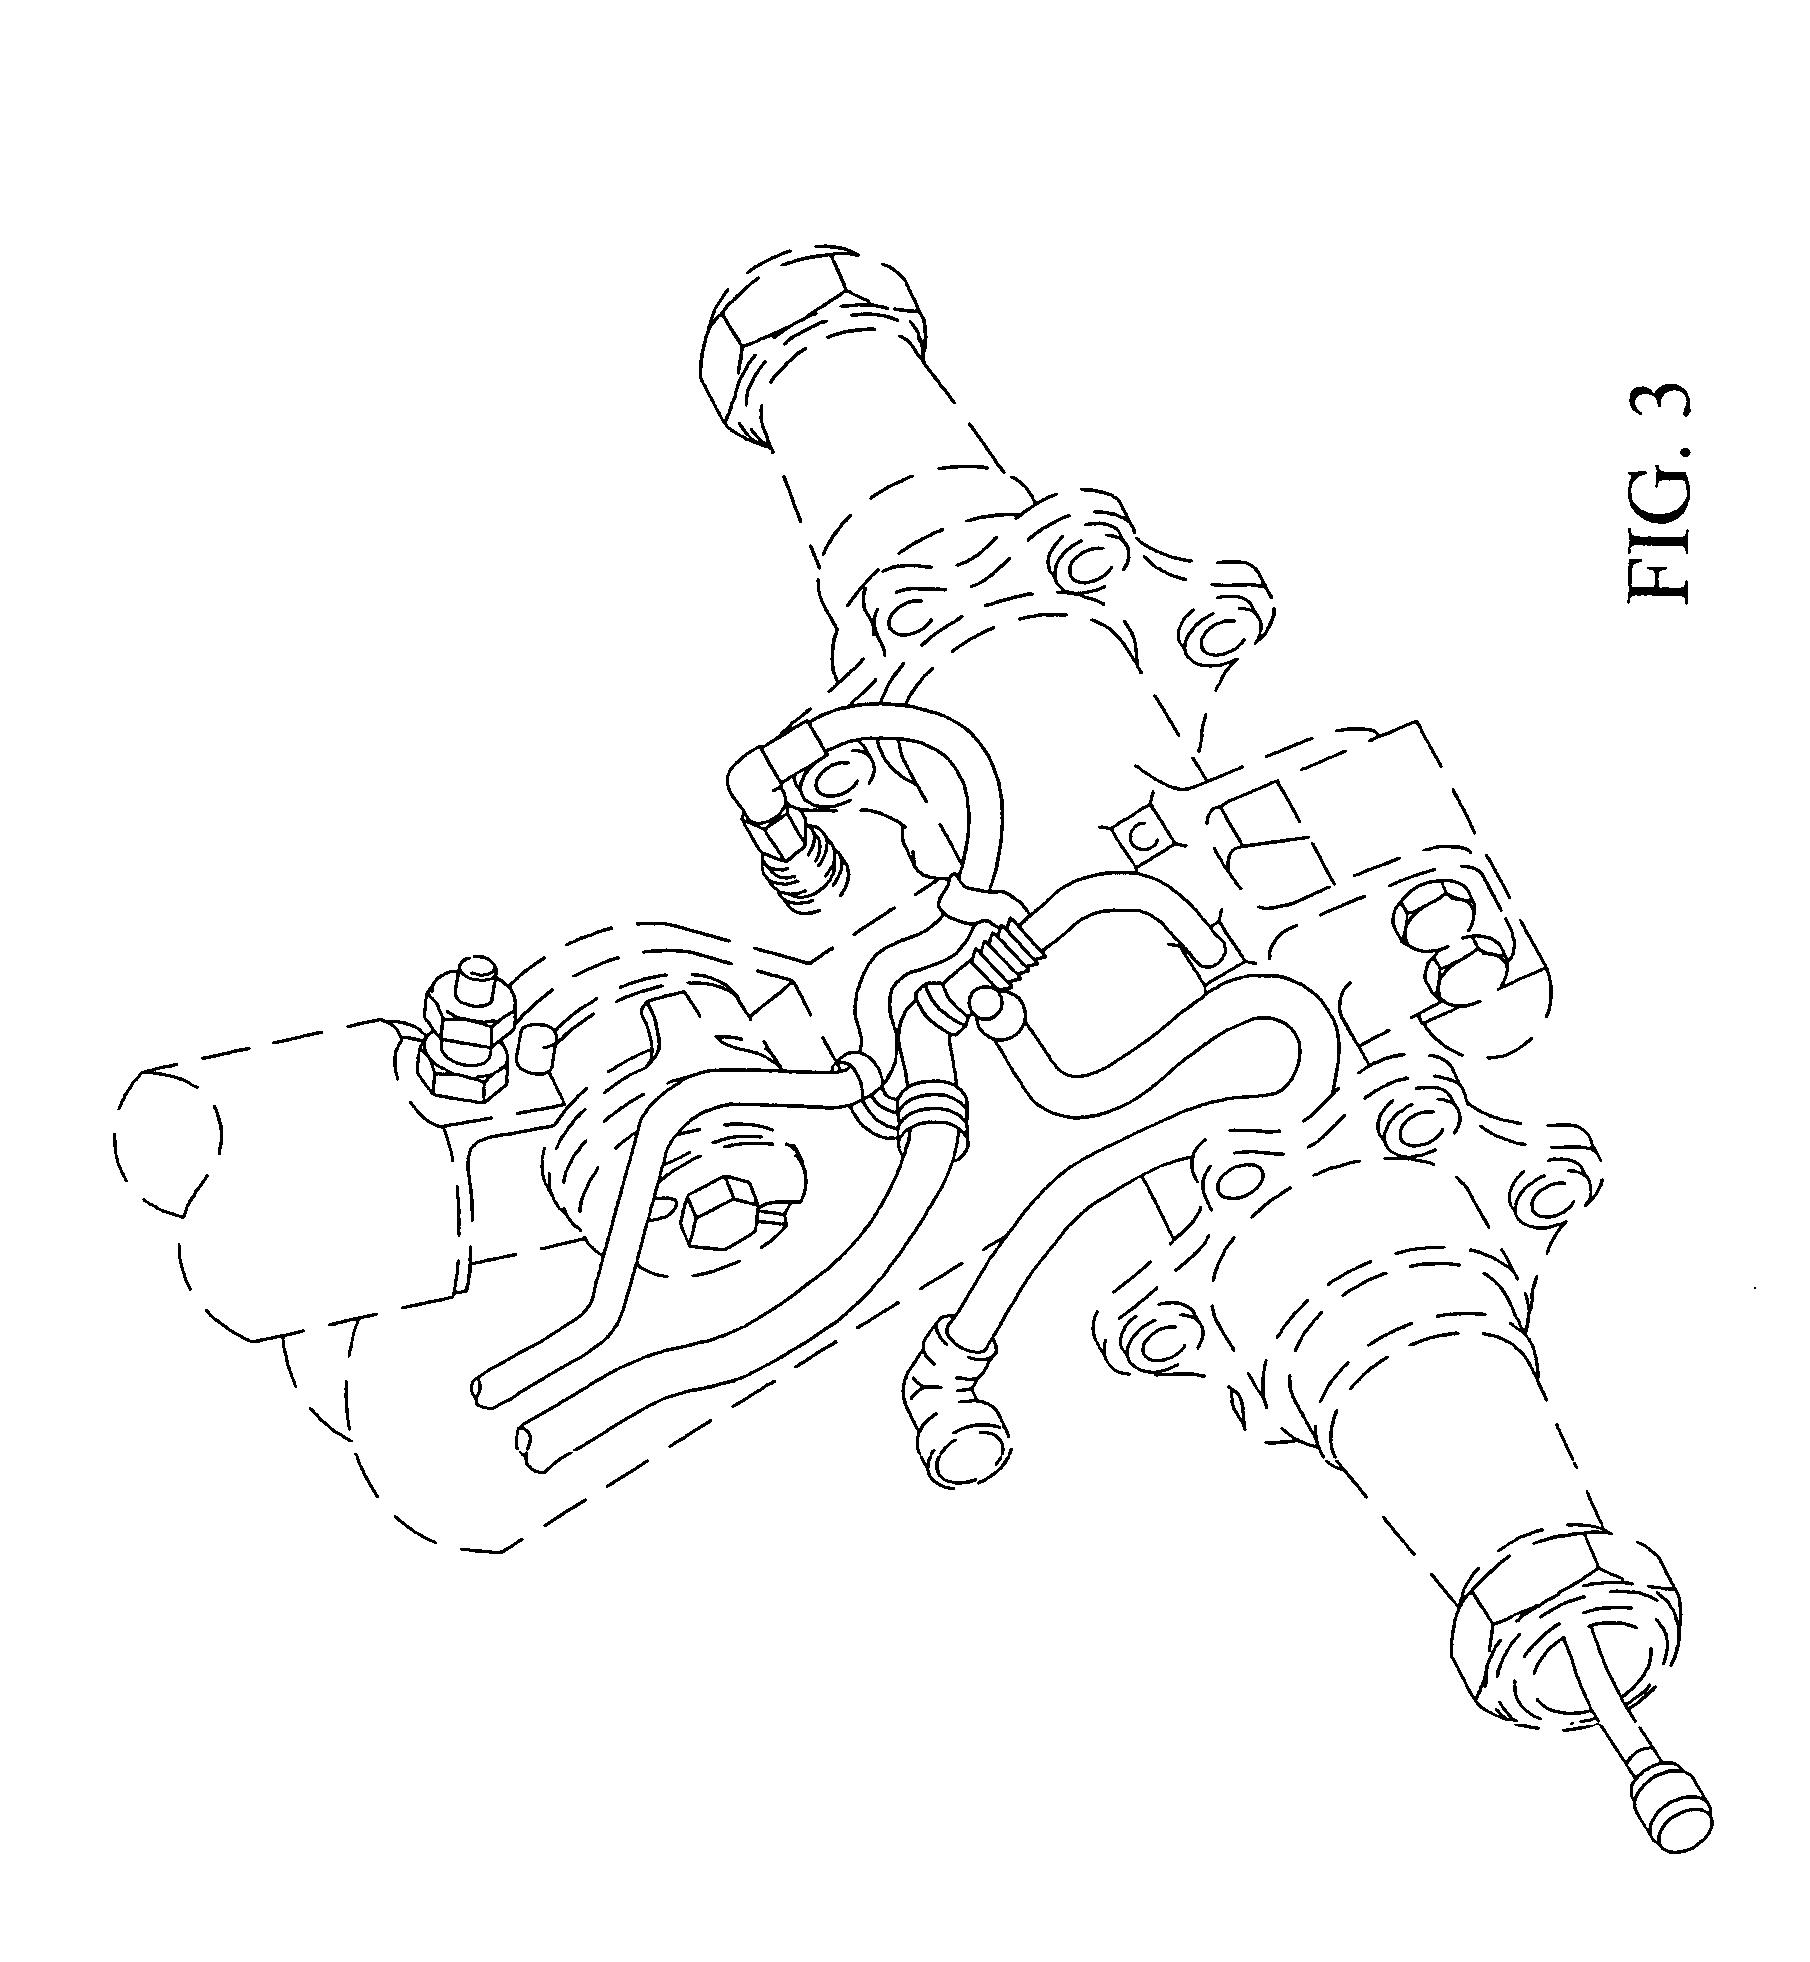 2007 mercedes r500 fuse box diagram  mercedes  auto fuse